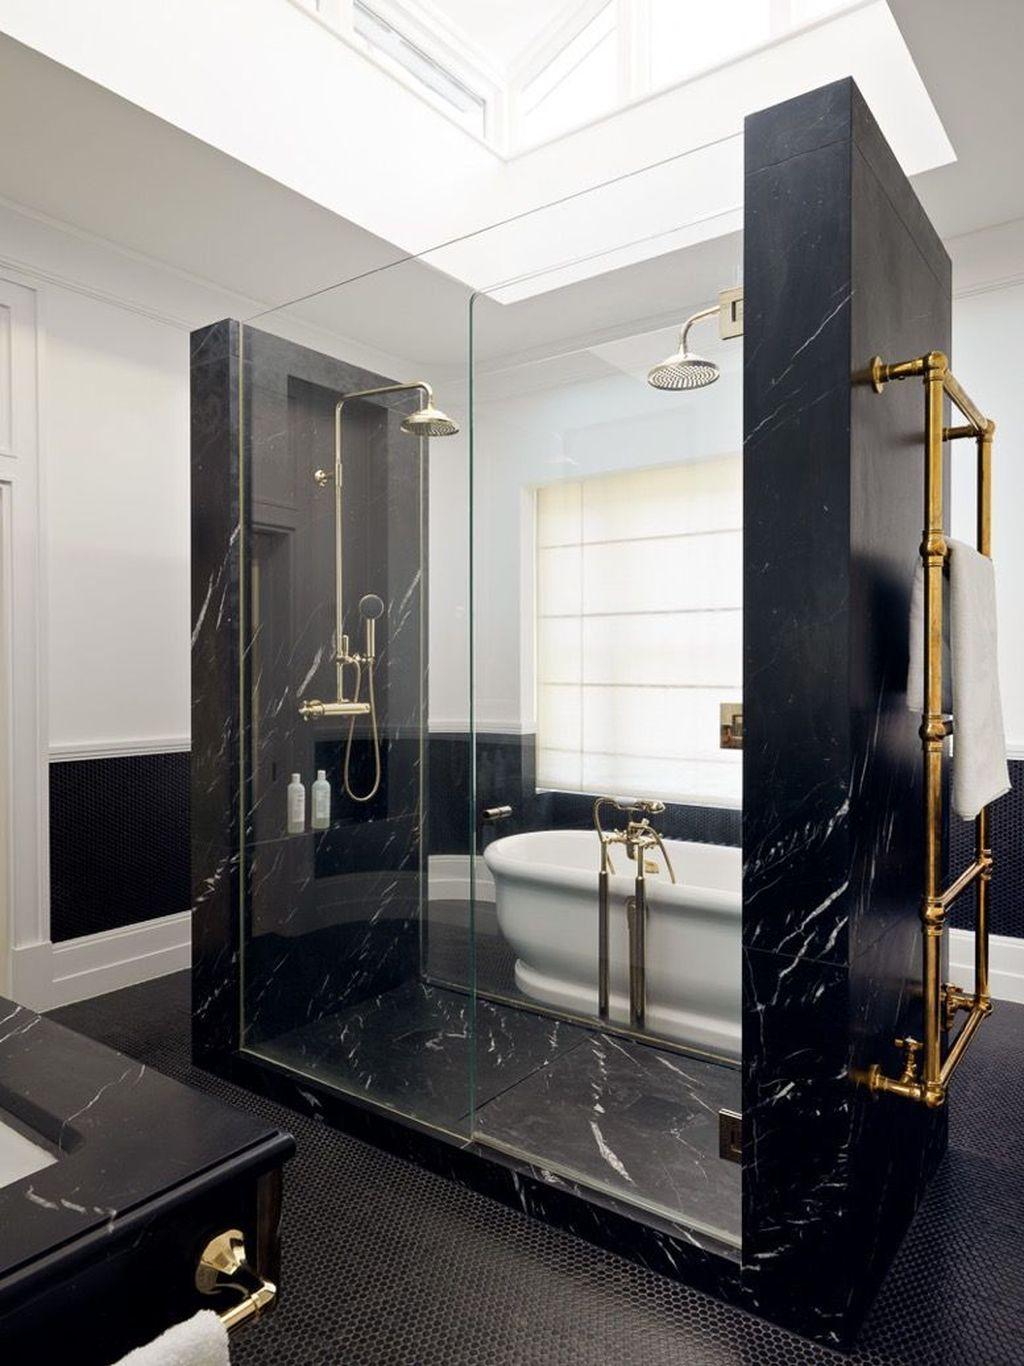 48 Stunning Black Marble Bathroom Design Ideas Marble Bathroom Designs Black Marble Bathroom Modern Bathroom Design